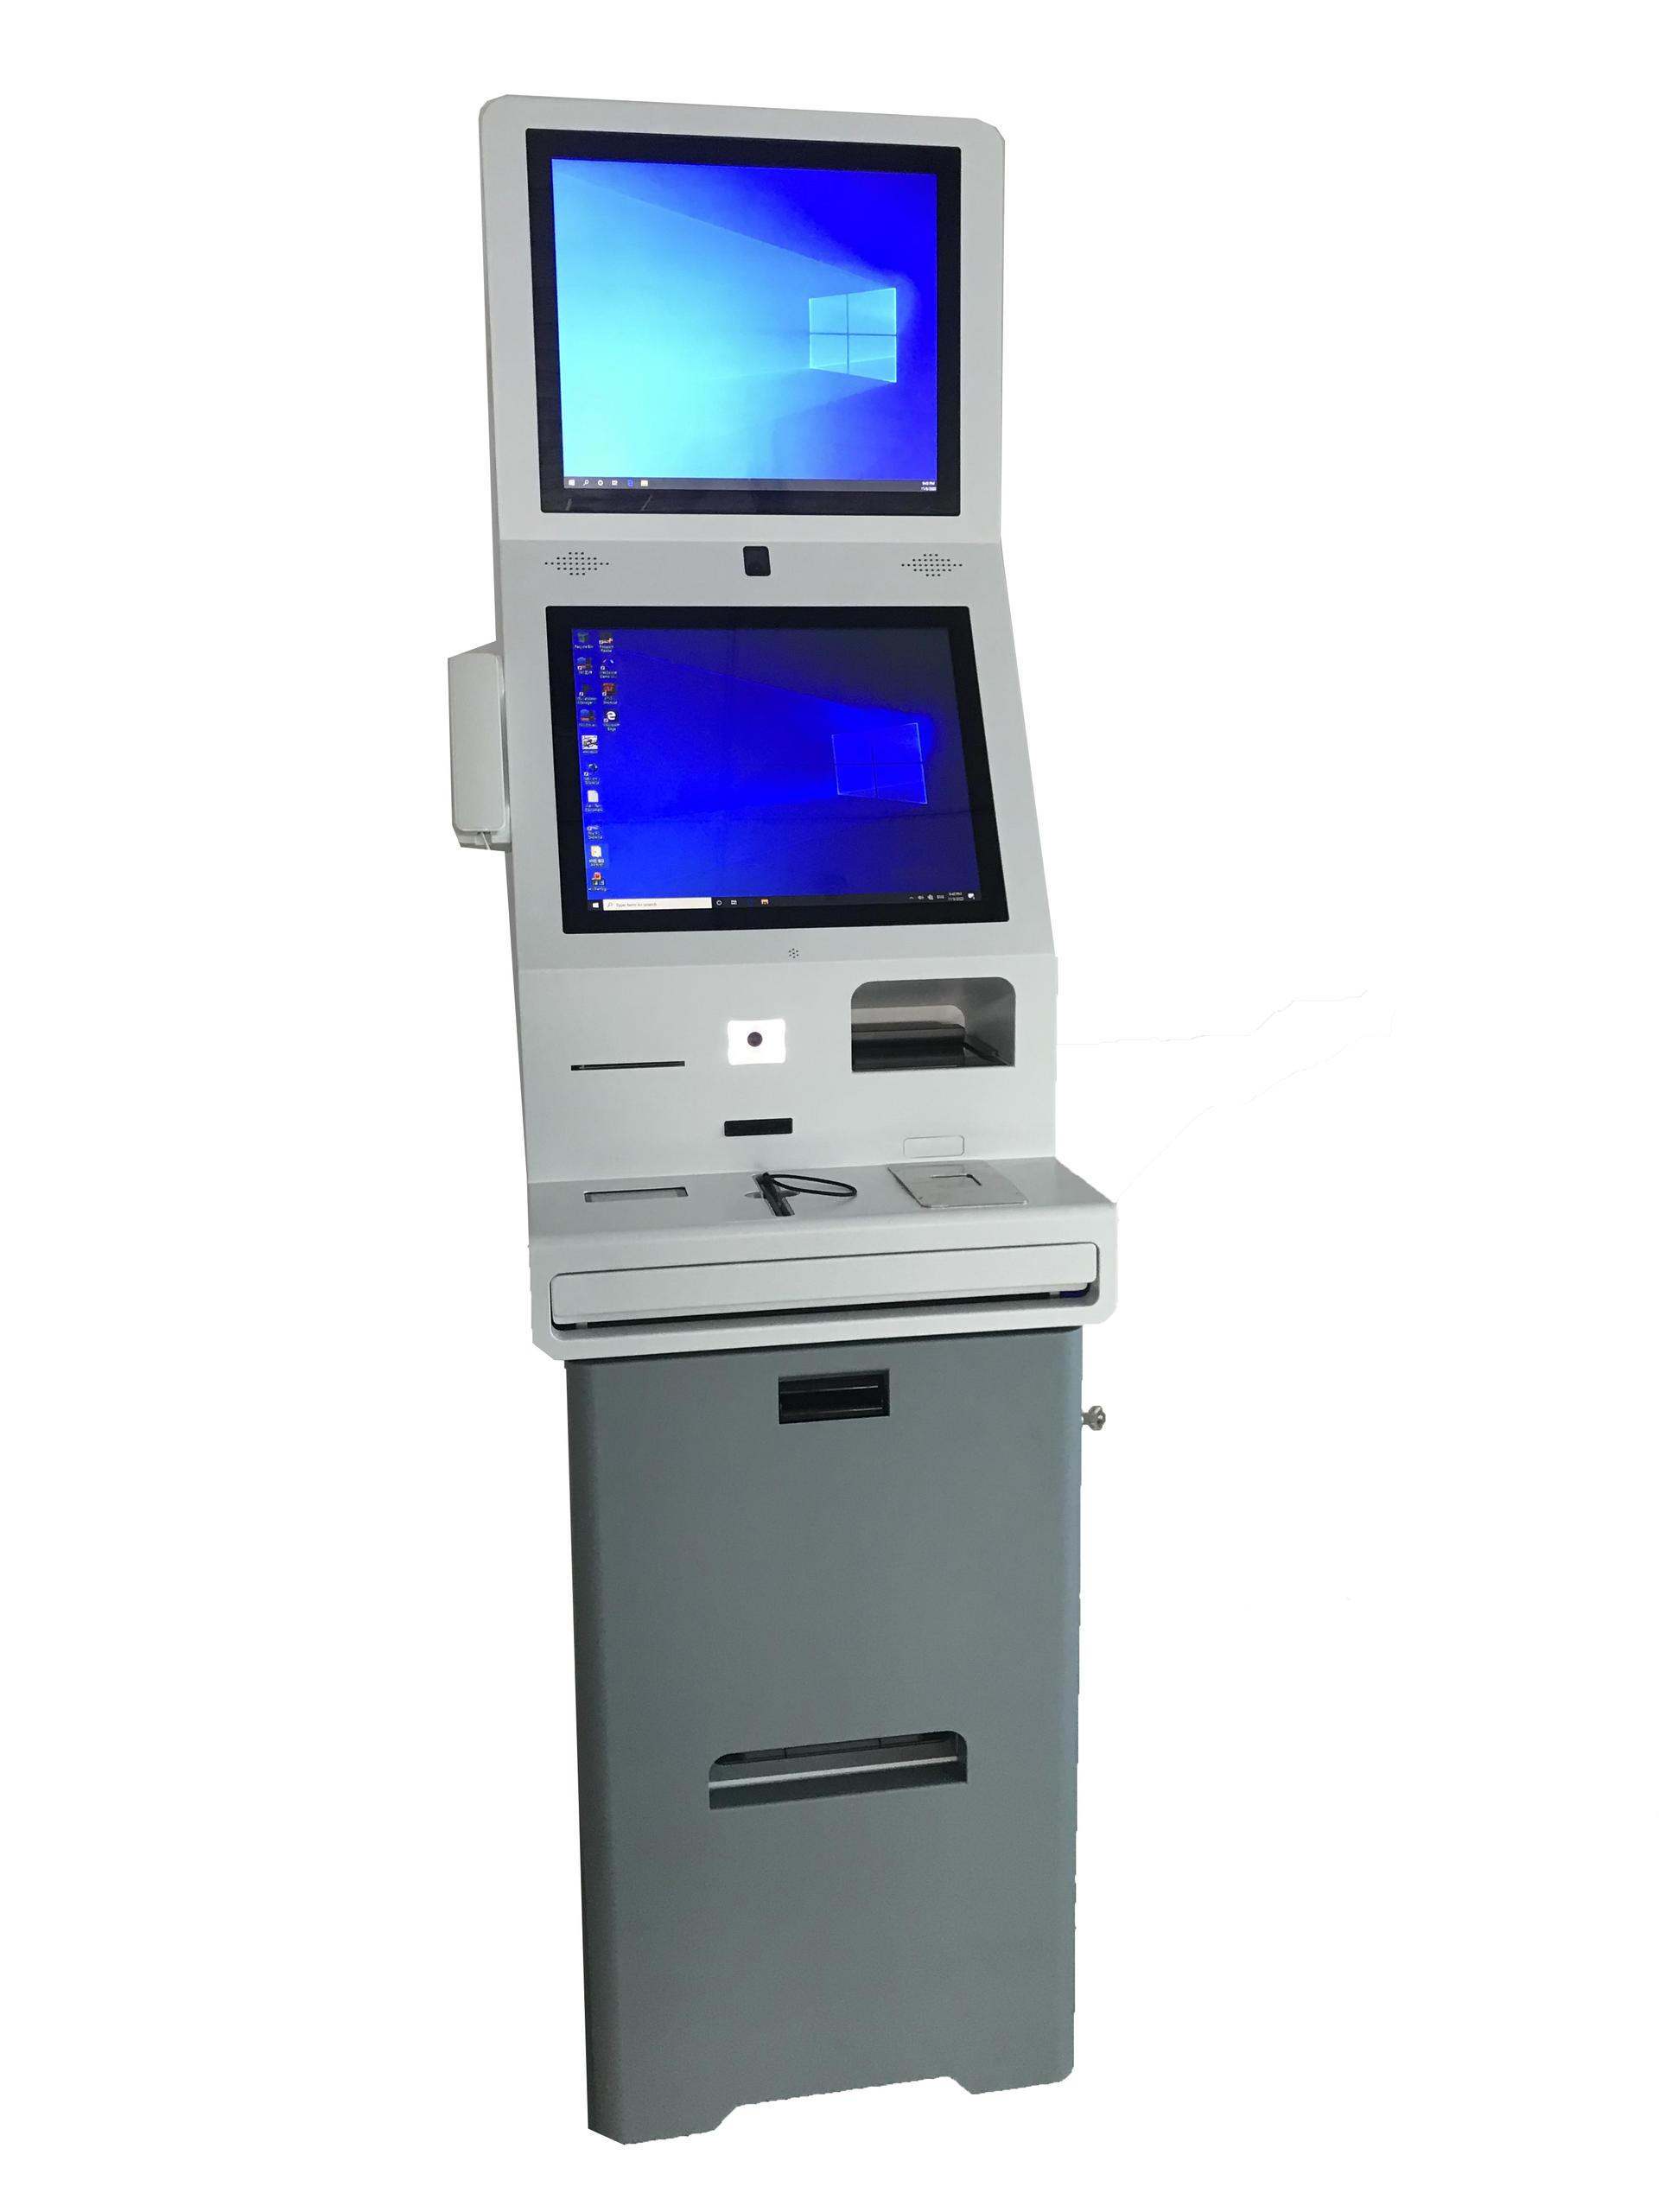 19 Inch Ticket Printer Kiosk Touch Screen Check in Kiosk Barcode Scanner